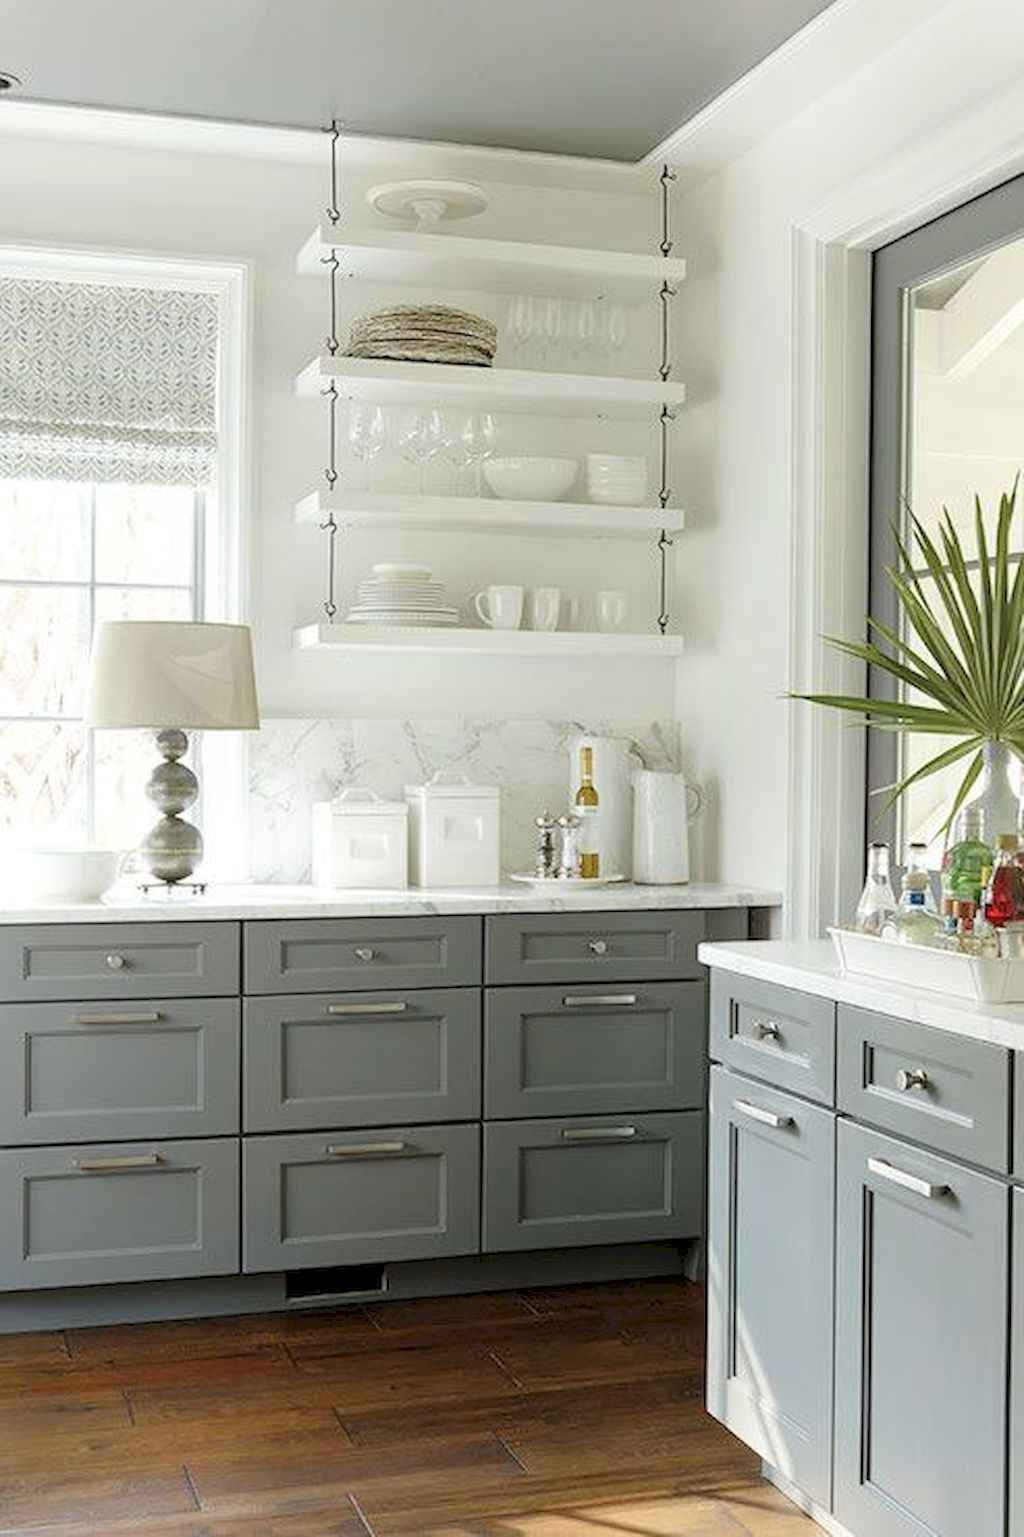 Gorgeous gray kitchen cabinet makeover ideas (55)